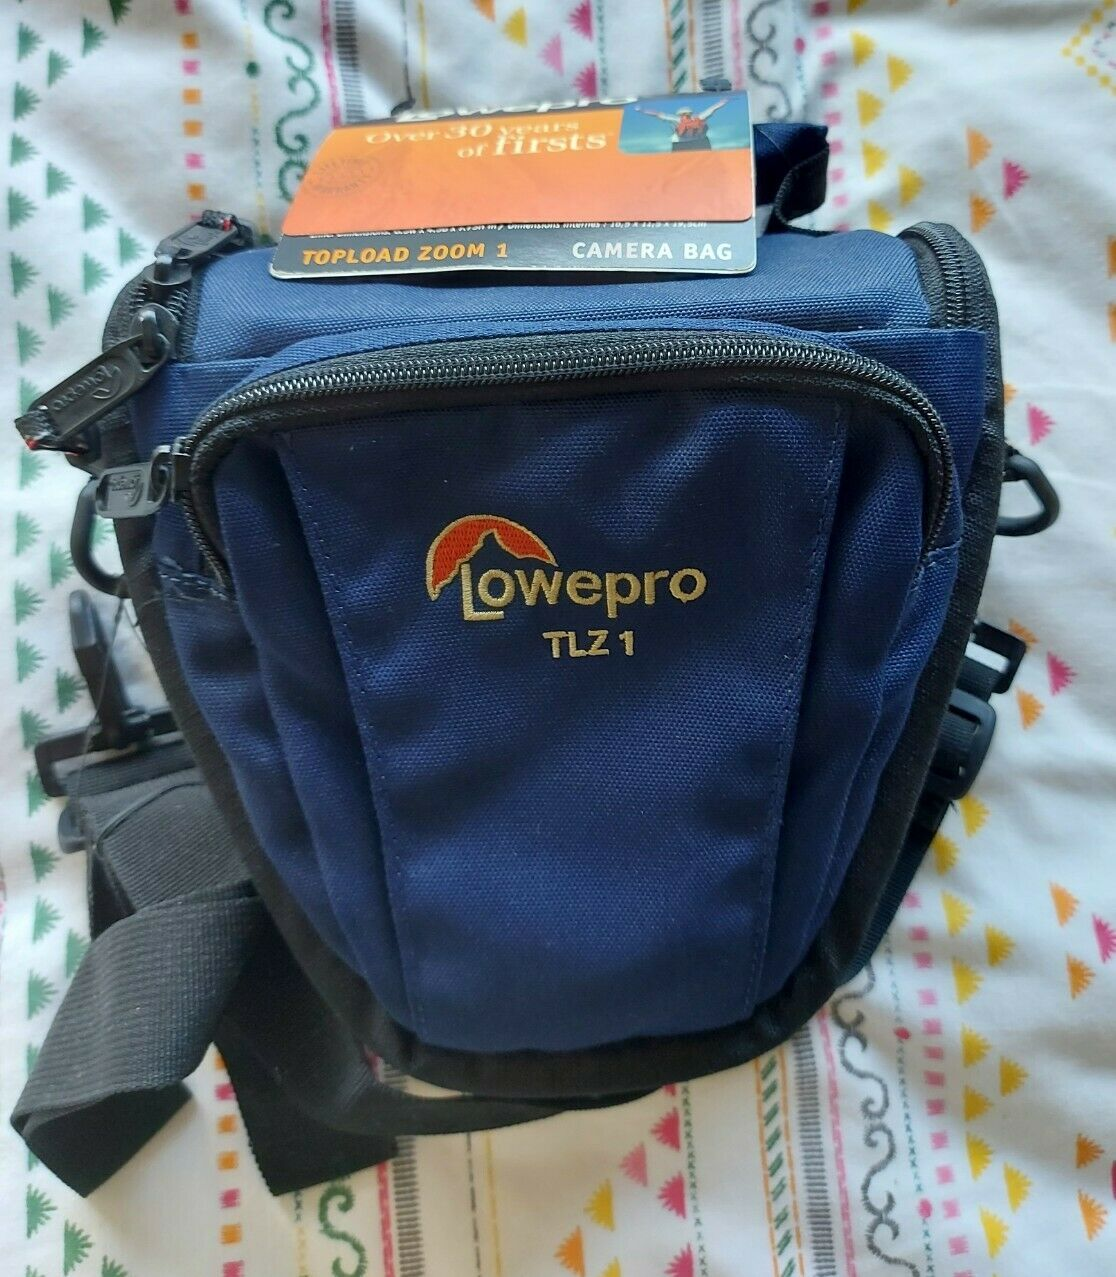 NEW LOWEPRO TLZ 1 Topload Zoom 1 Camera Bag - Navy Blue